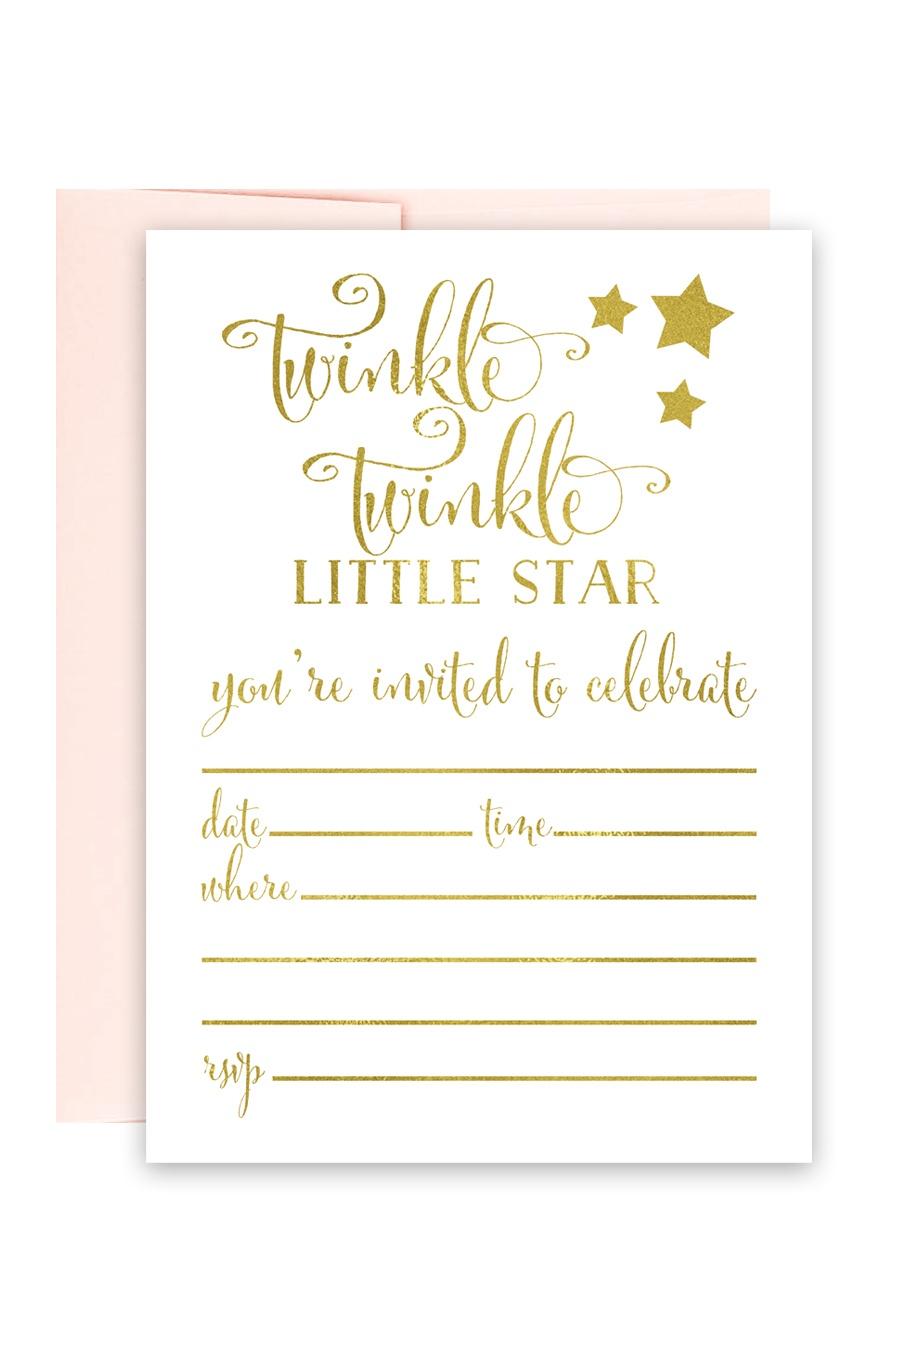 Twinkle Twinkle Little Star Foil Invitations - Chicfetti - Free Printable Twinkle Twinkle Little Star Baby Shower Invitations